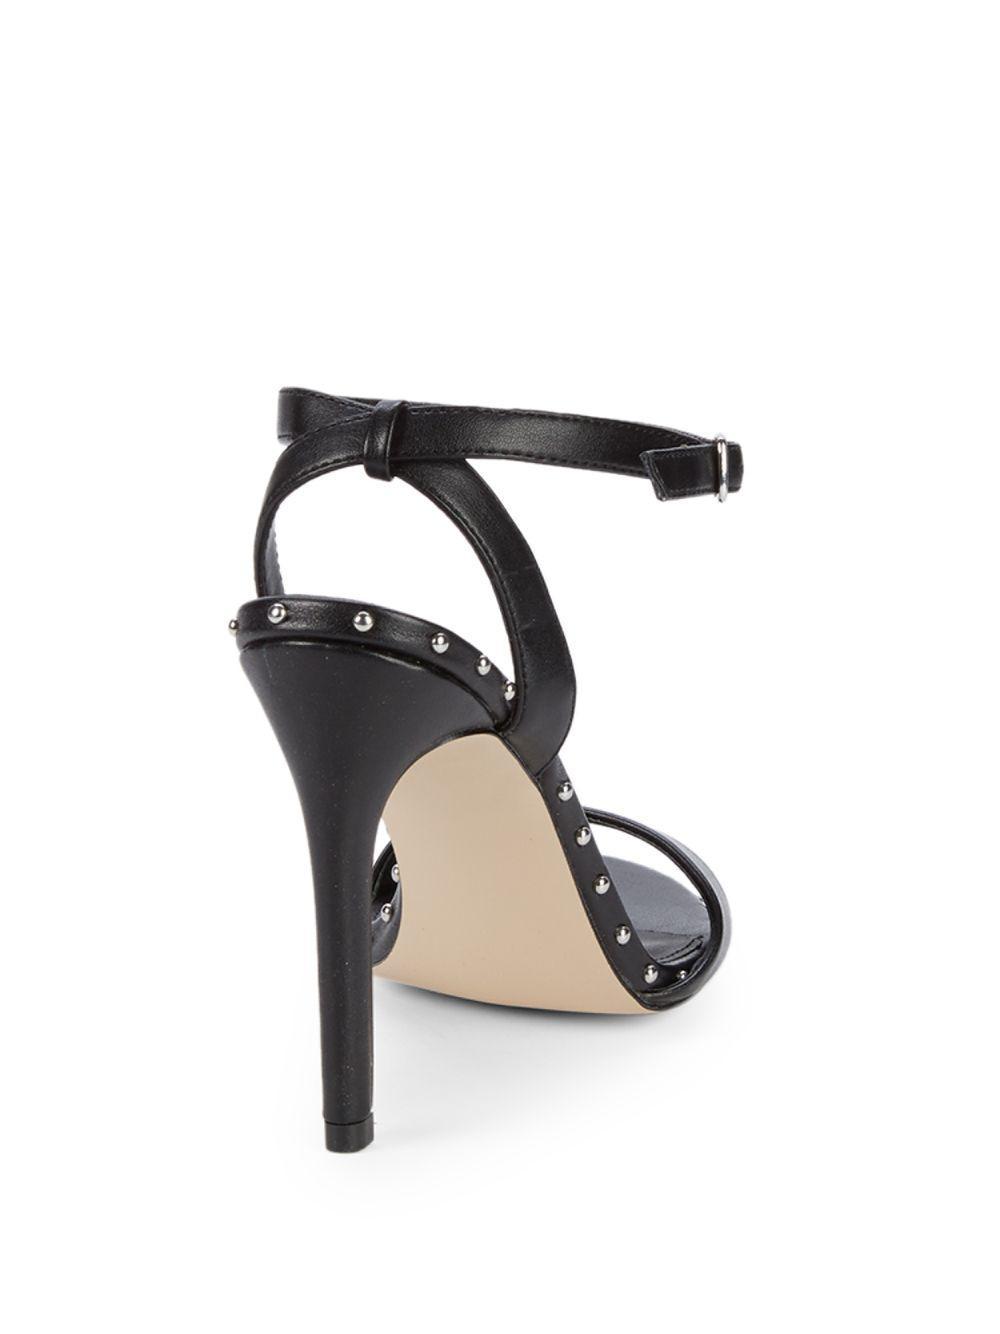 19a5a39d6db Lyst - Steve Madden Raea Studded Stiletto Sandals in Black